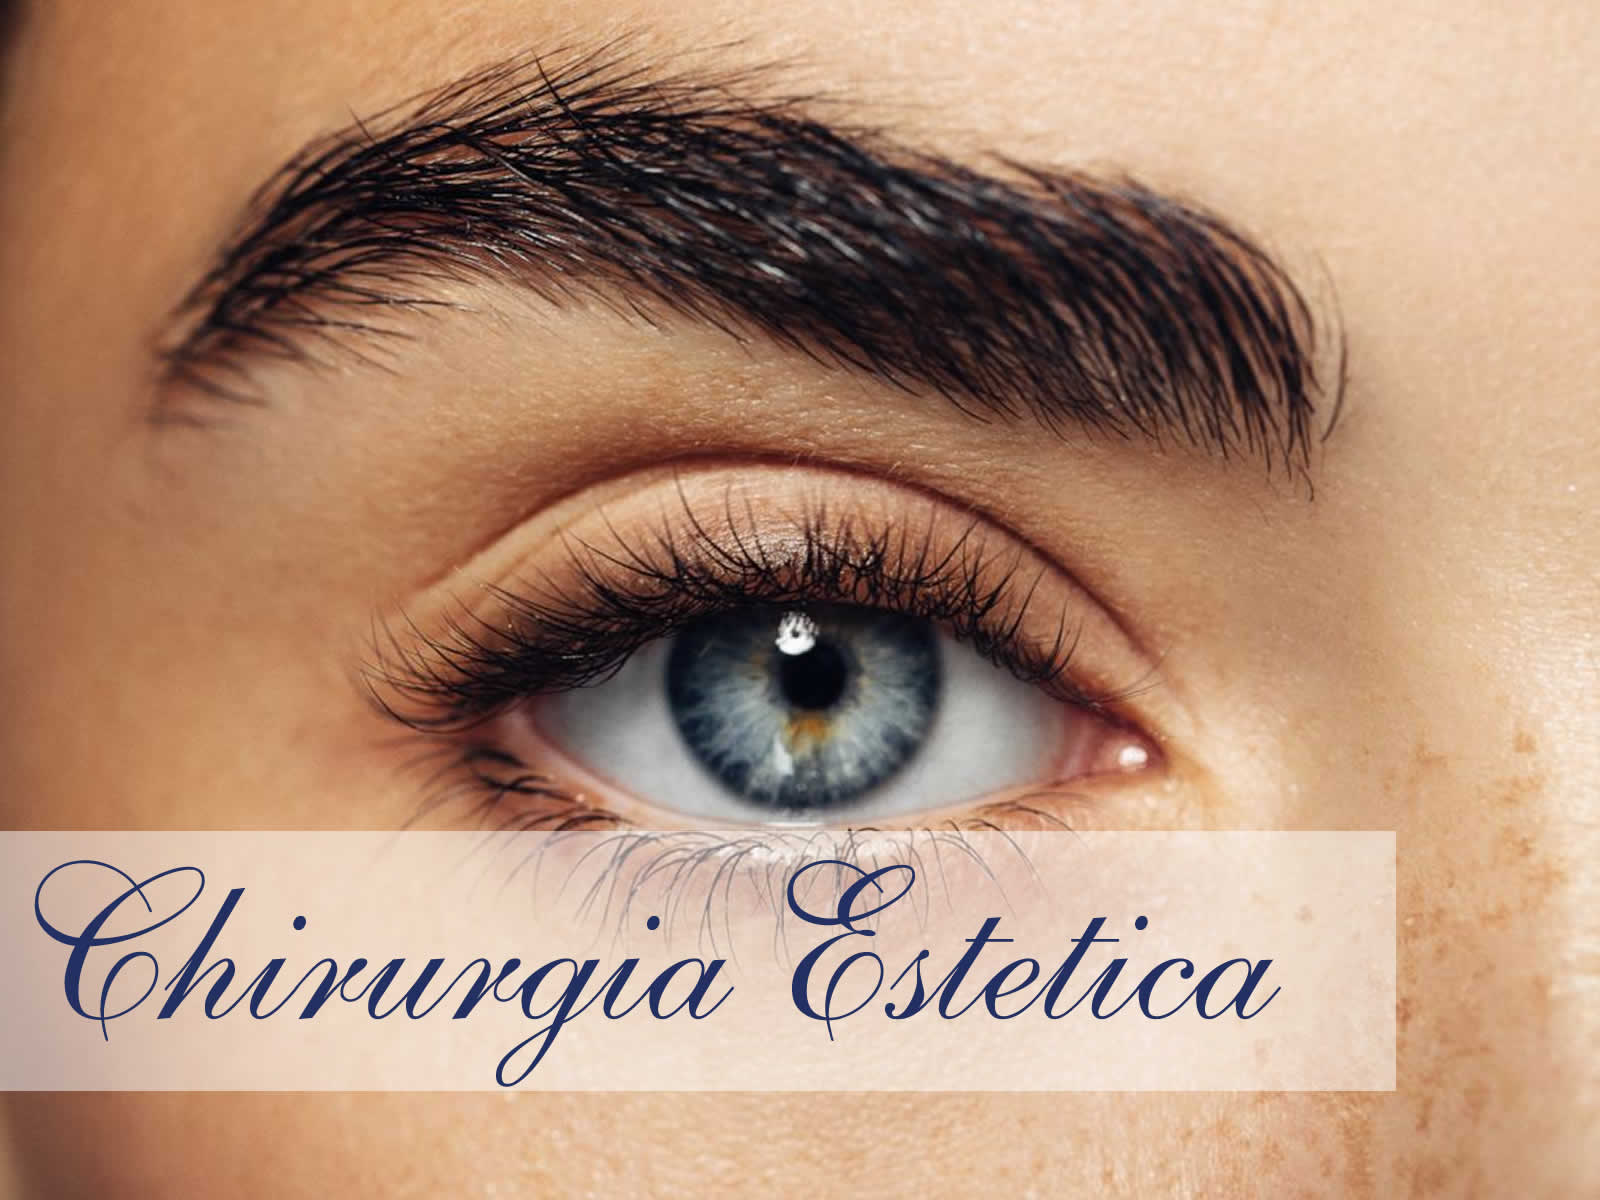 Eur Montagnola - Chirurgo Estetico: Blefaroplastica a Eur Montagnola